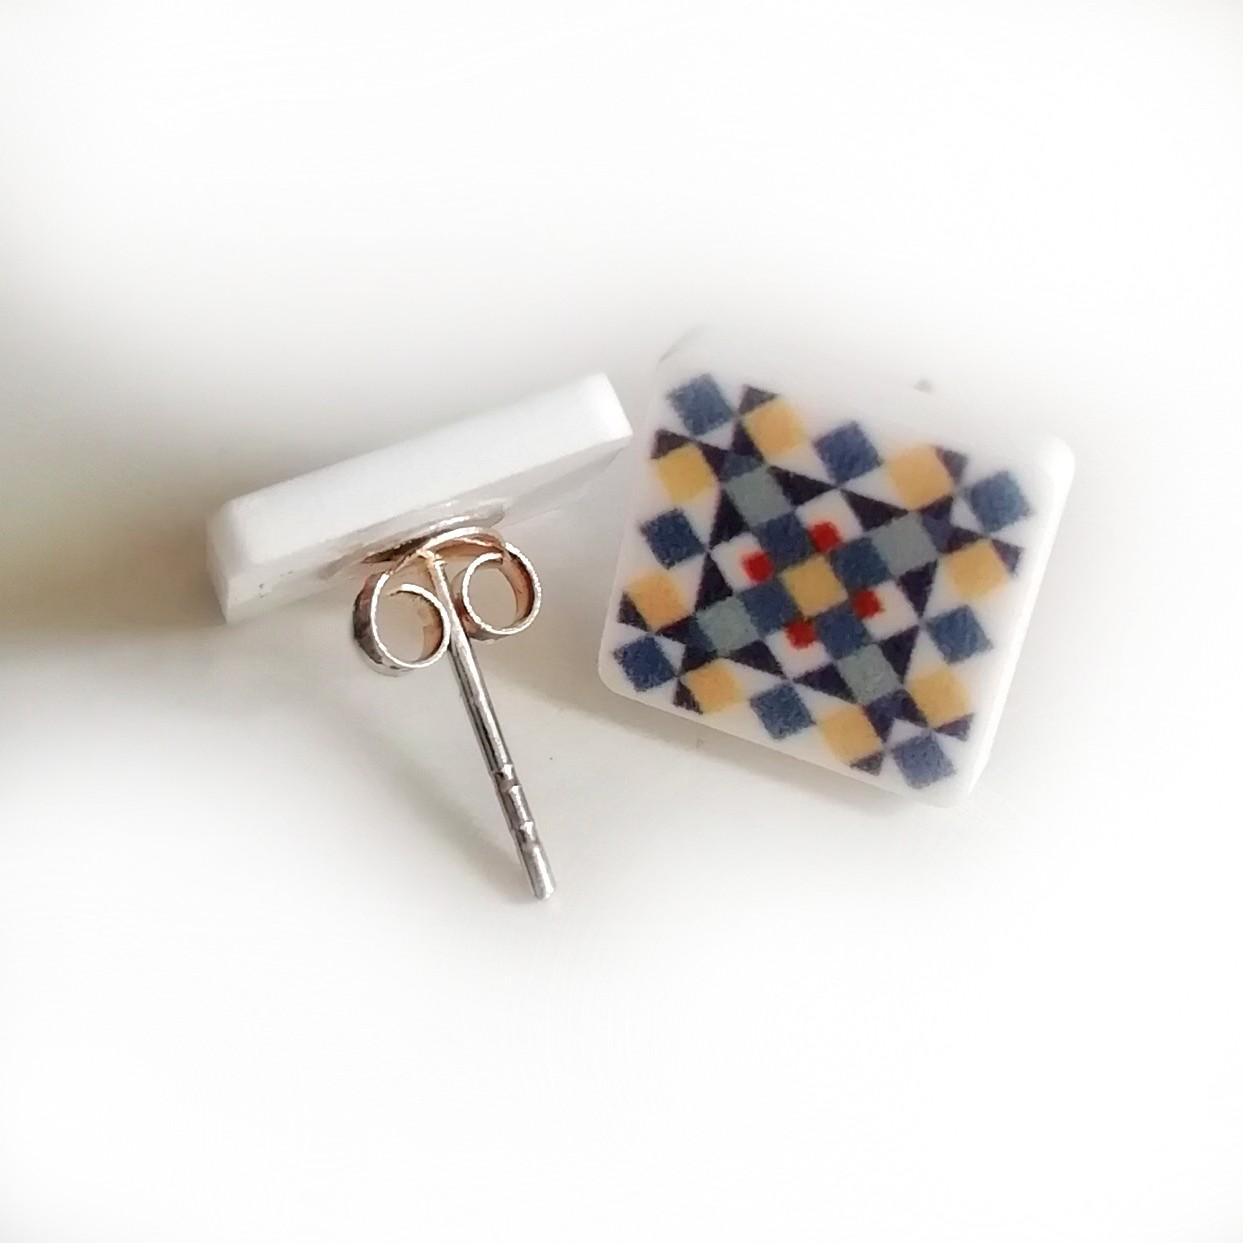 arrecades mosaic E argent popelin barcelona